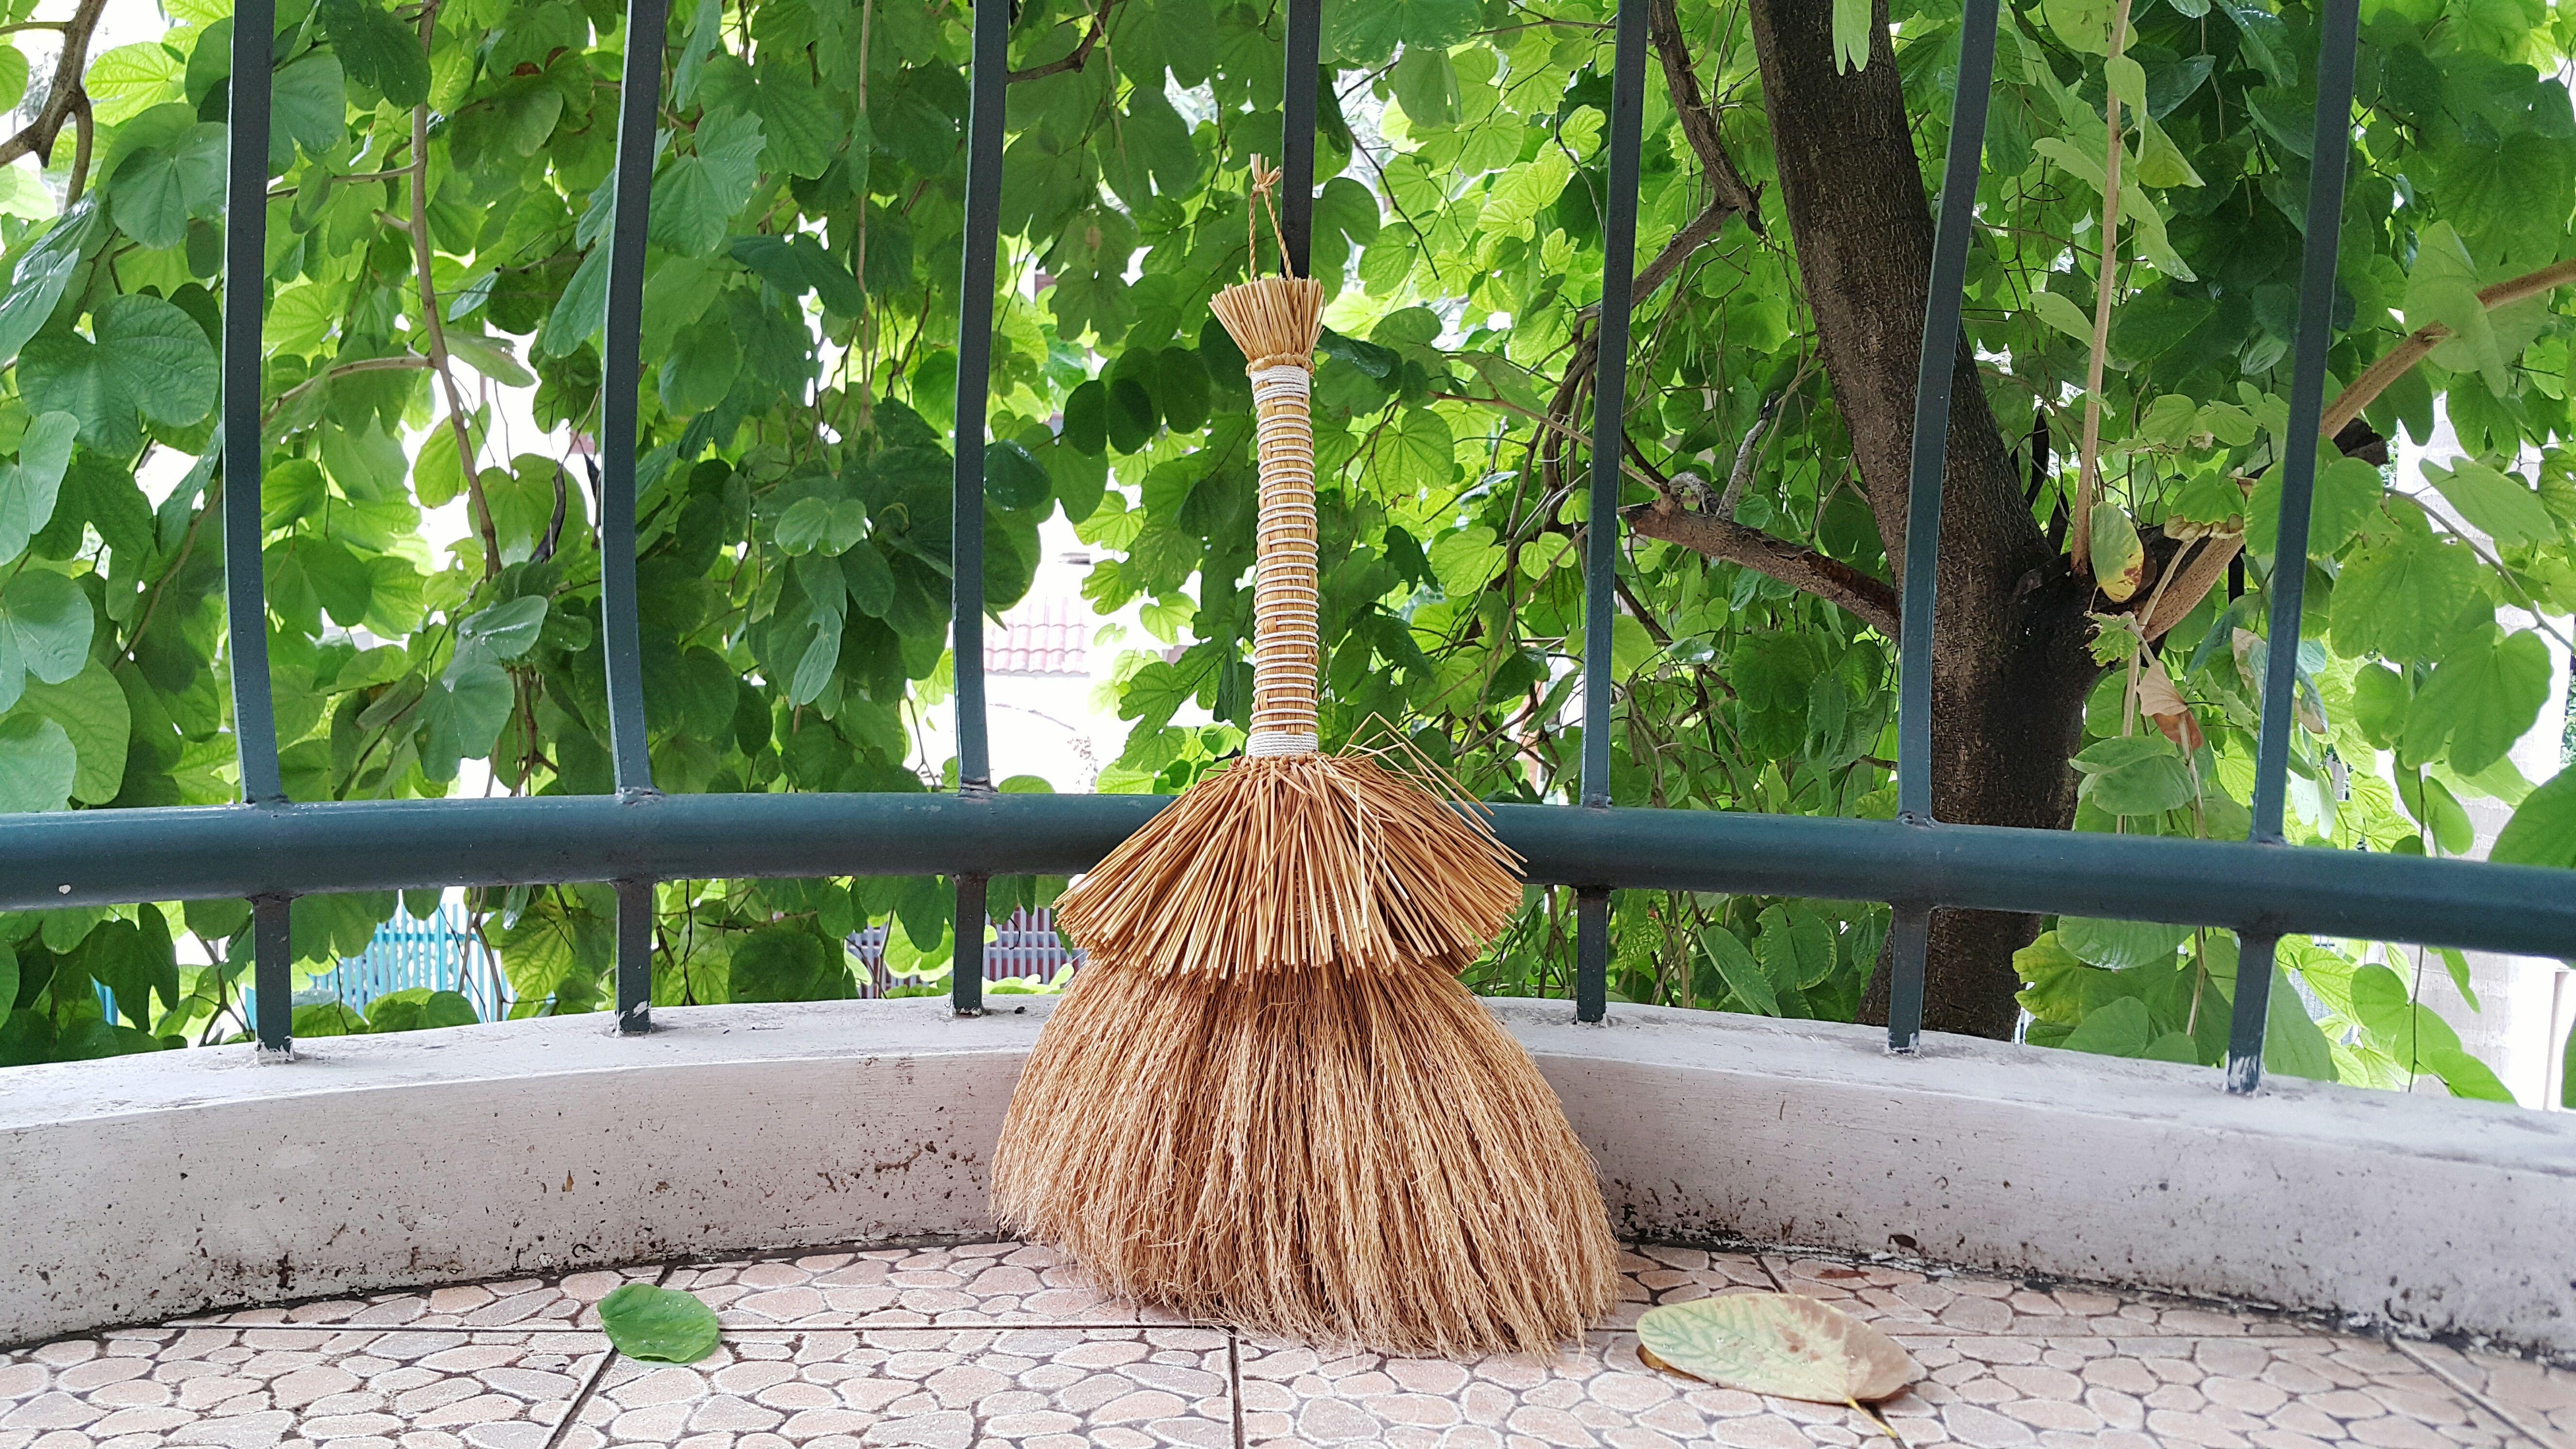 Broom In Balcony Against Railing